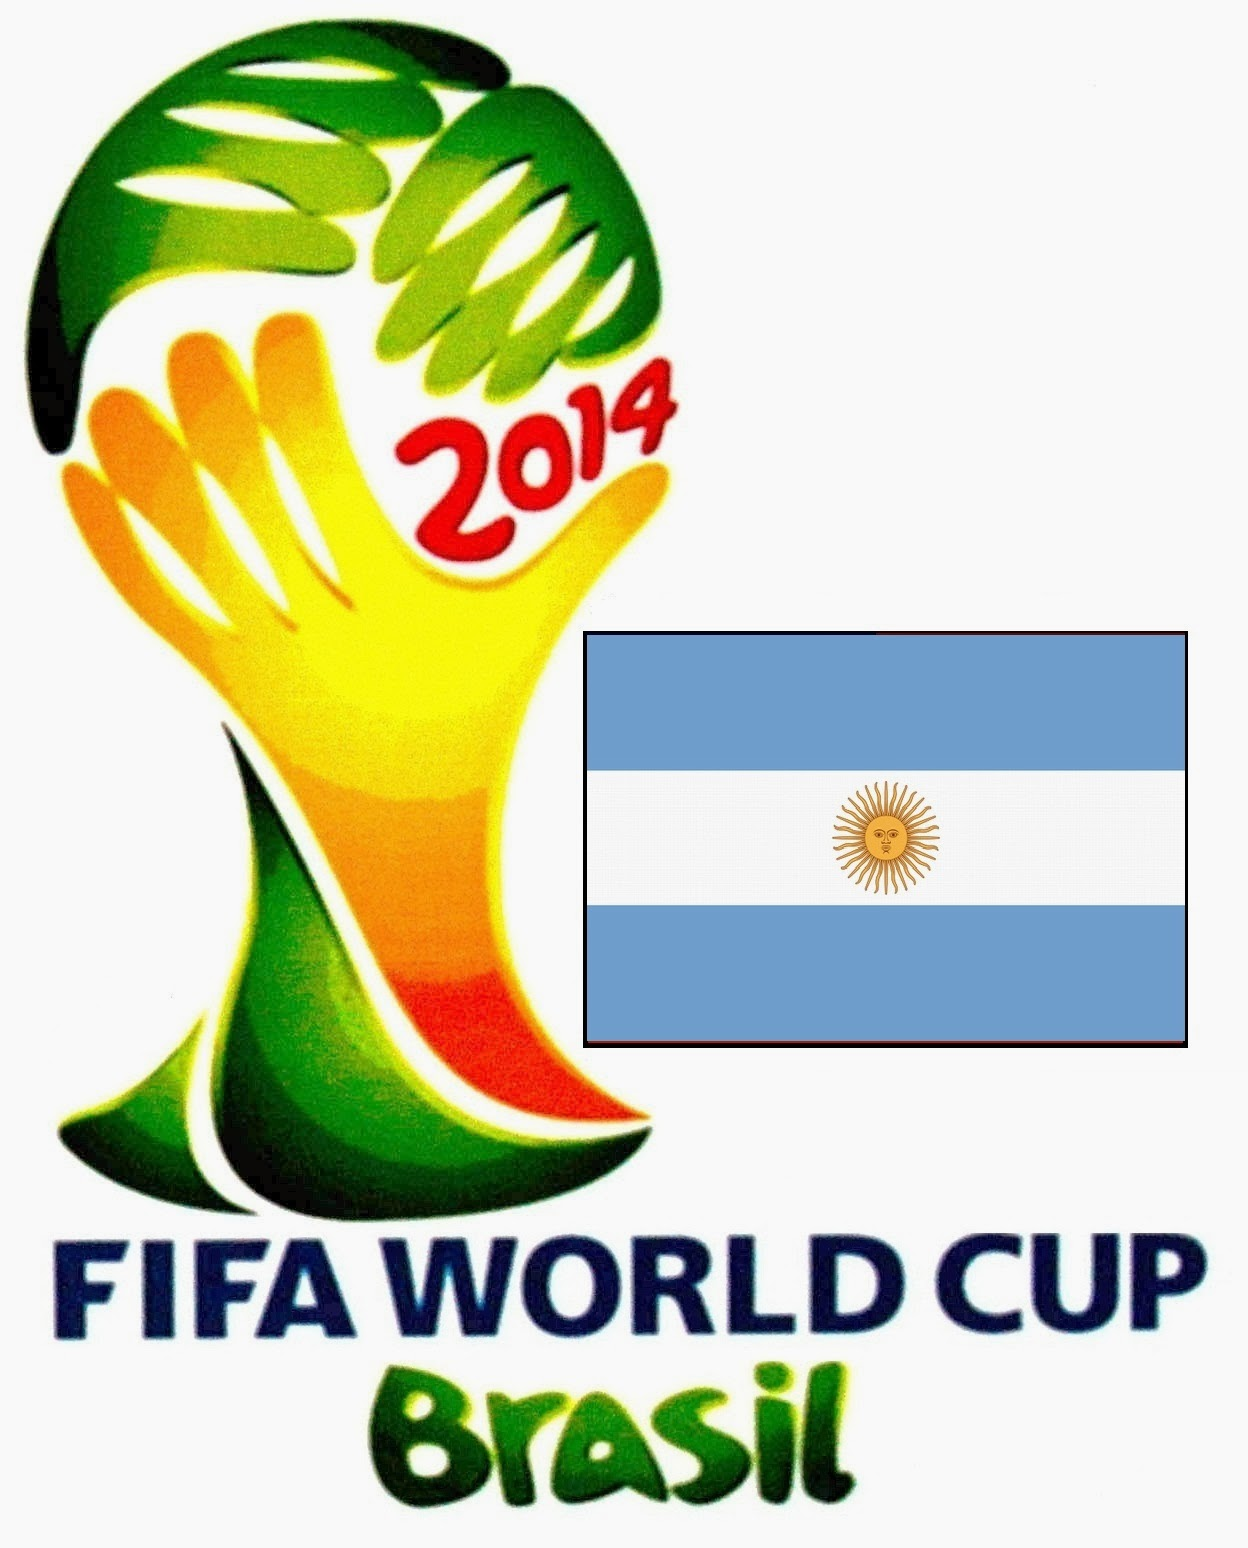 Daftar Nama Pemain Timnas Argentina Piala Dunia 2014